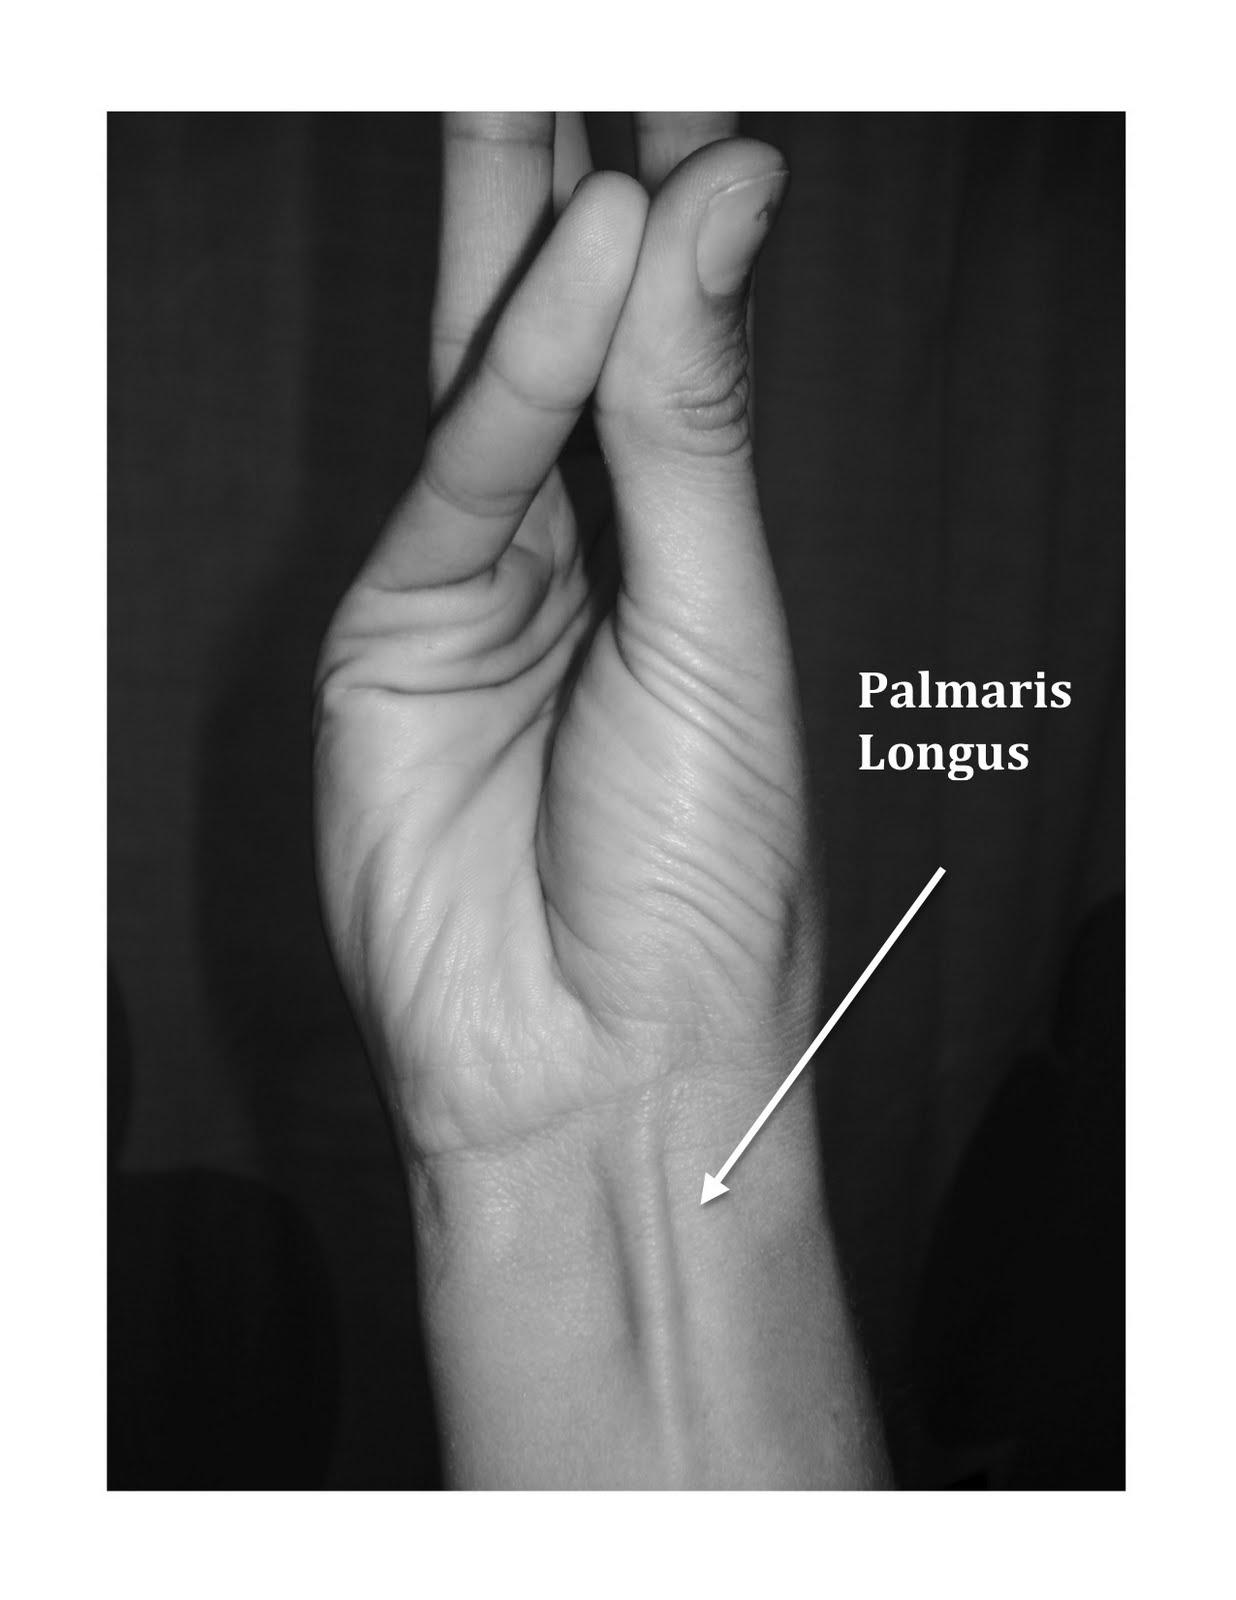 Do You Have A Palmaris Longus Tendon